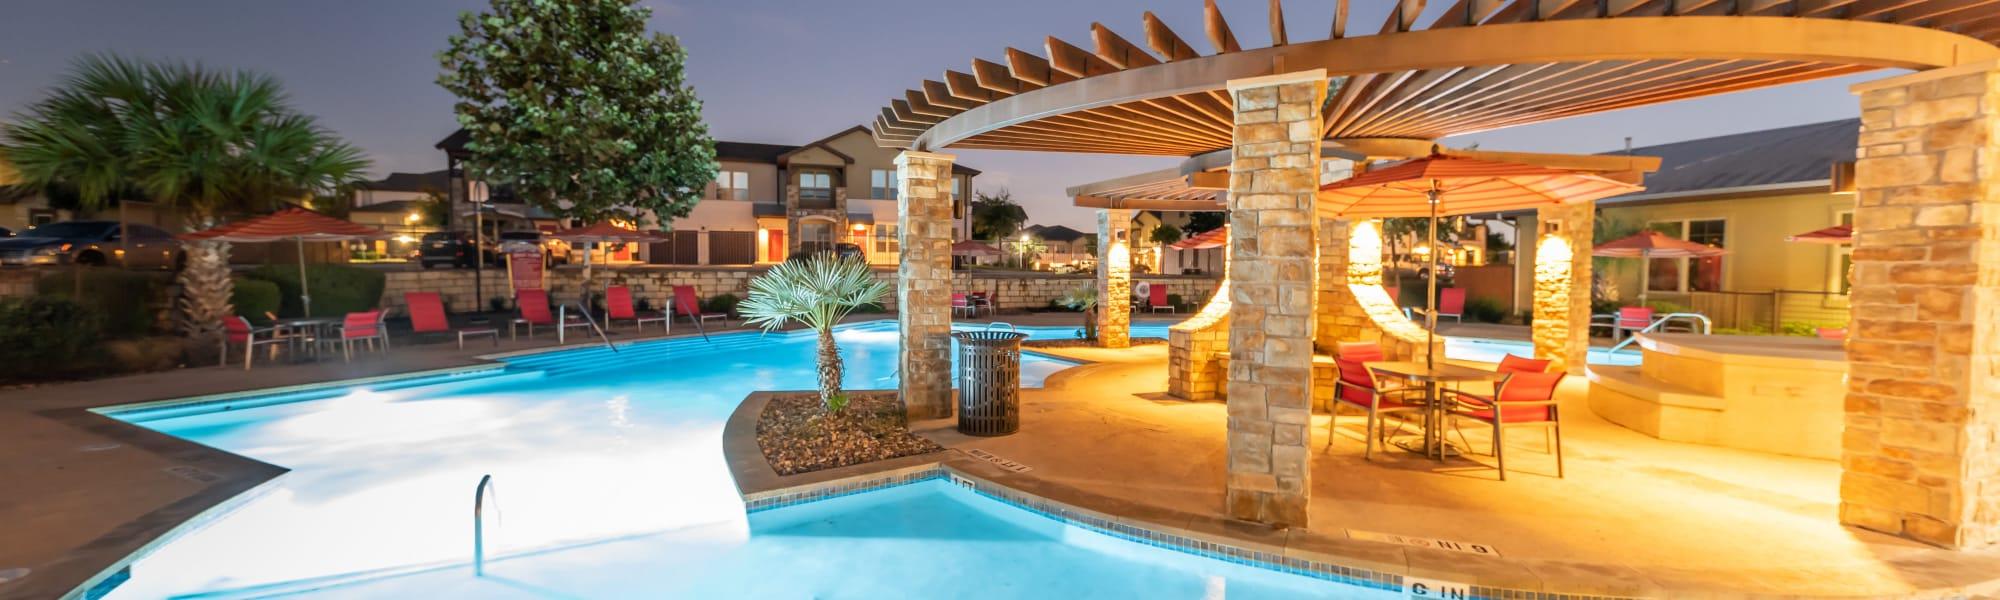 Photos of Firewheel Apartments in San Antonio, Texas